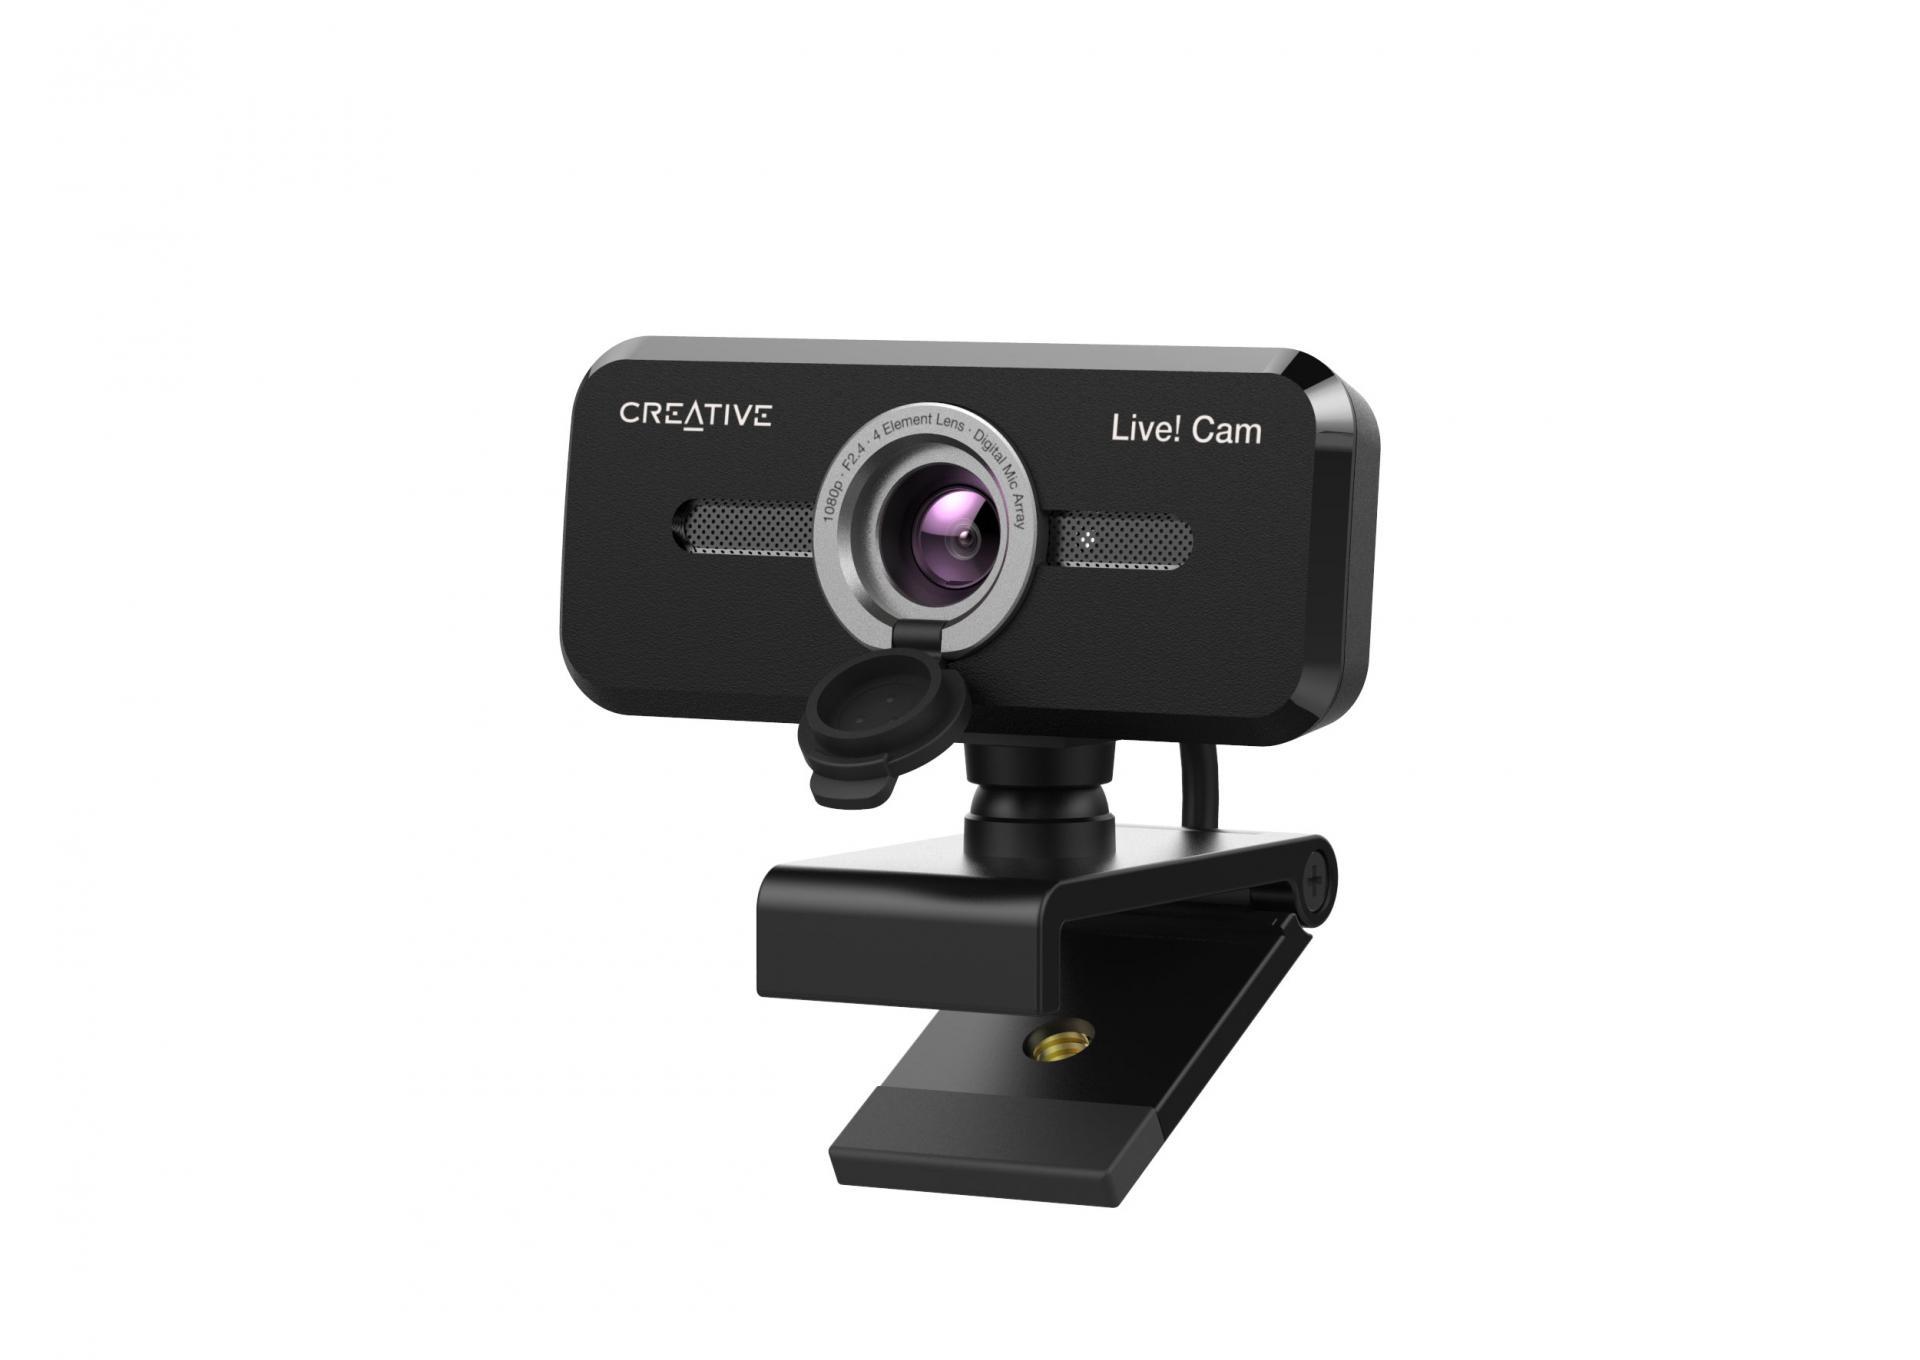 Новые продукты Creative: веб камера Live! Cam Sync 1080p V2 игарнитура SXFI AIR GAMER